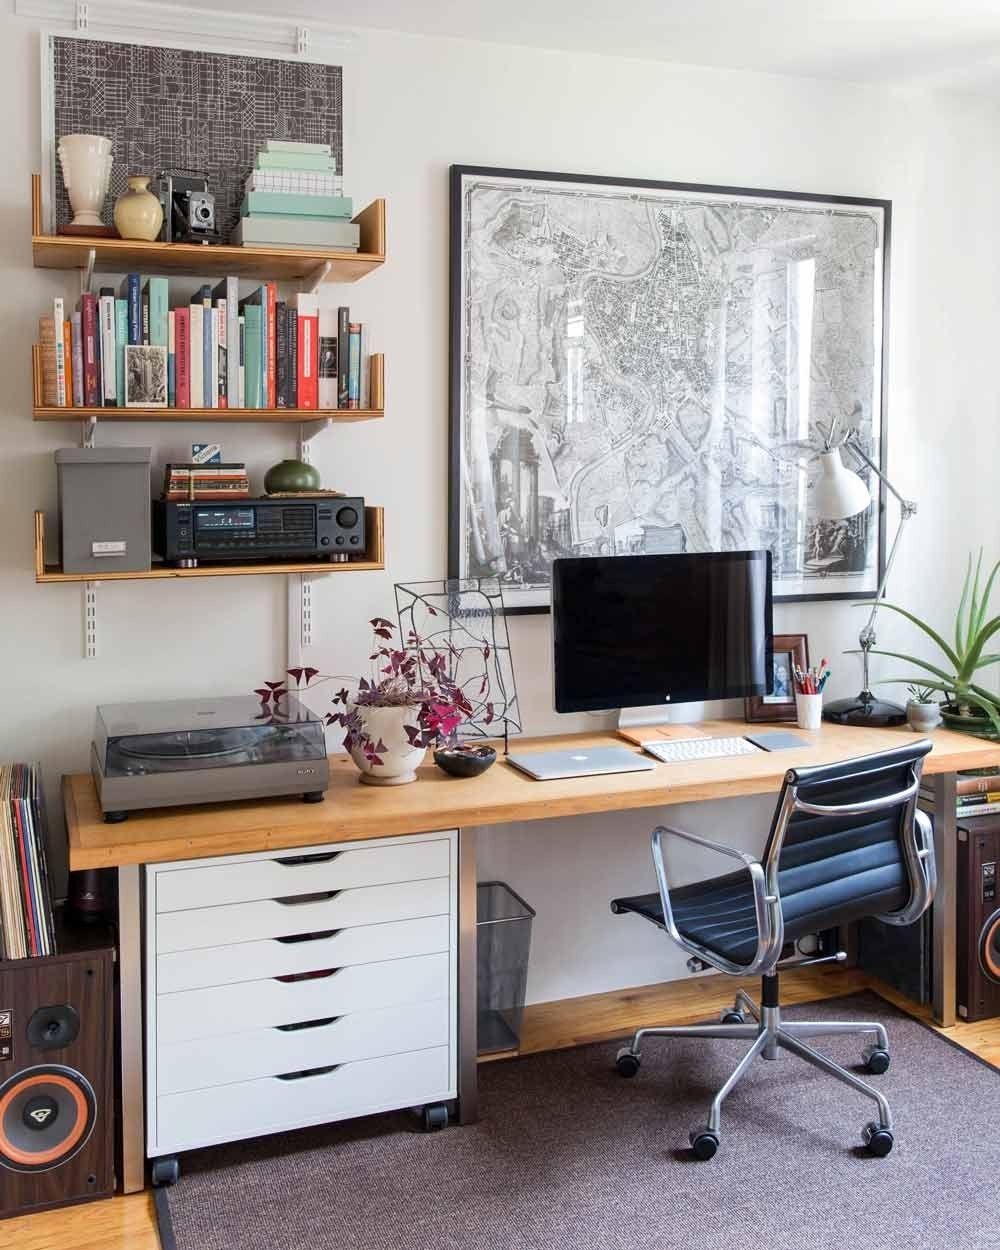 Office inspiration studio office decor ideas pinterest for Office space inspiration